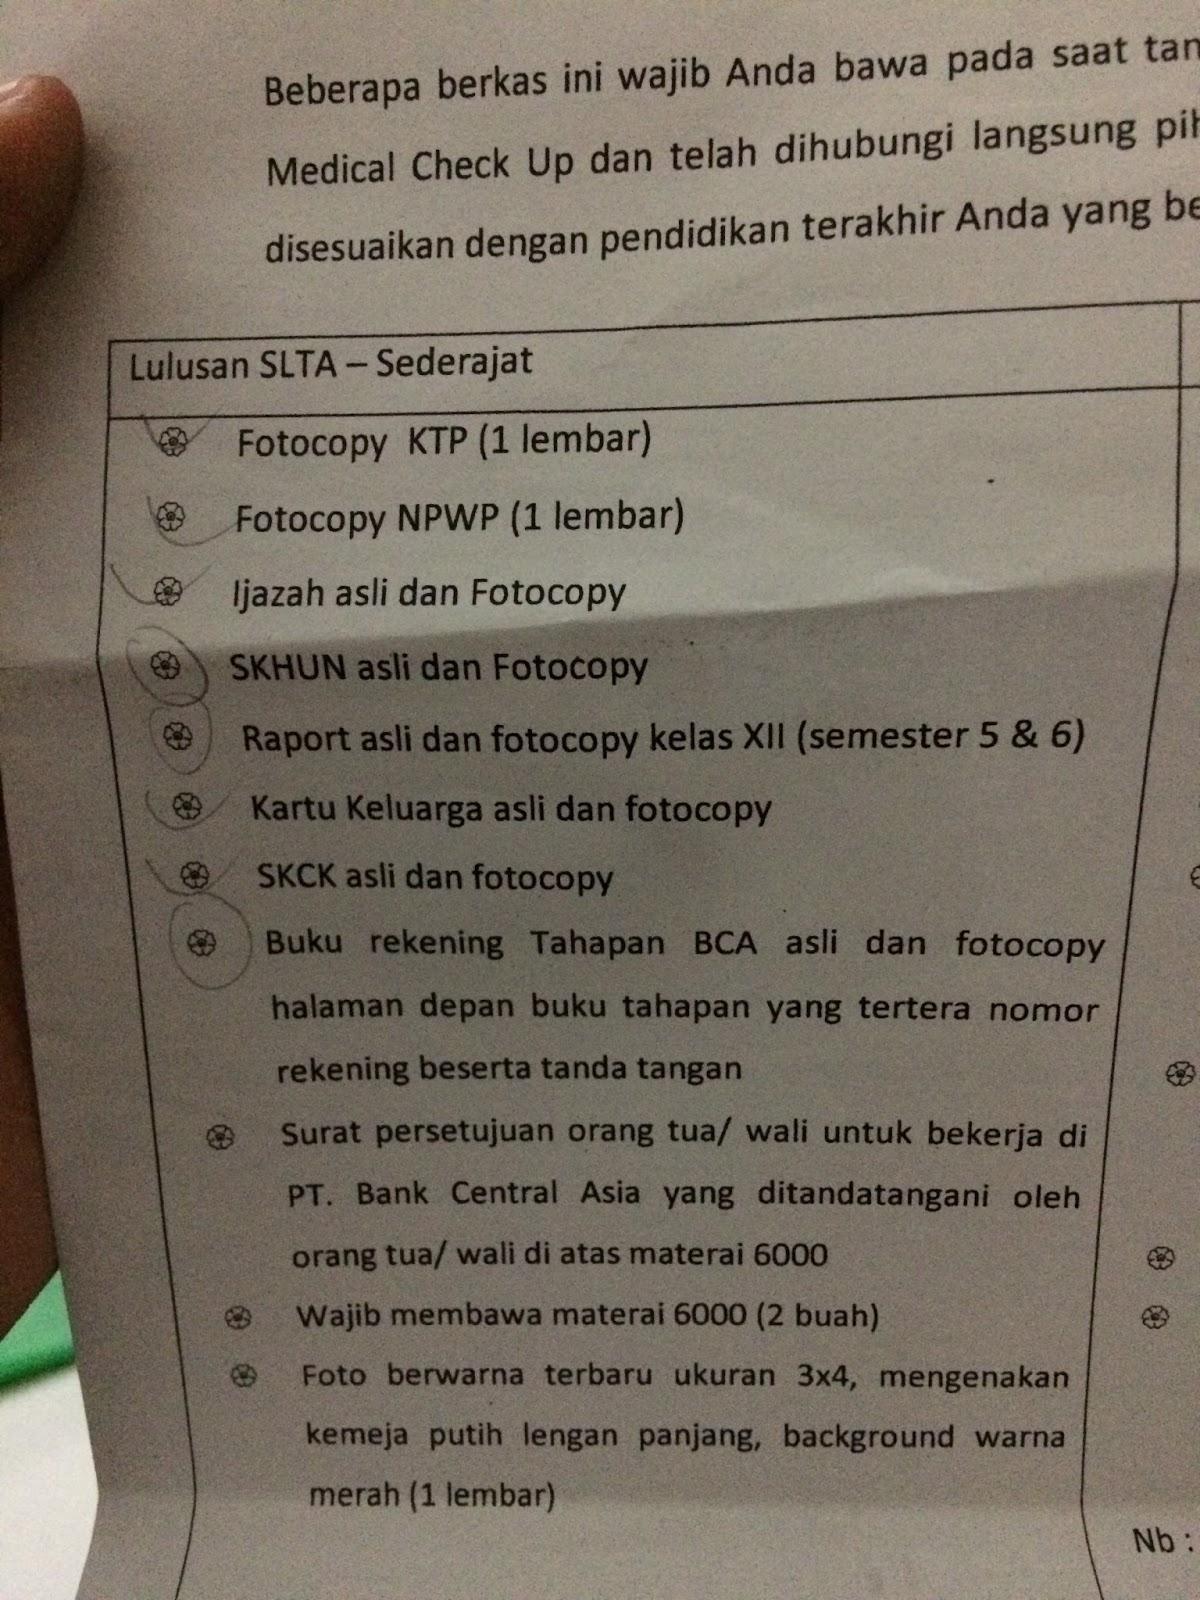 Contoh Surat Persetujuan Orang Tua Untuk Bekerja Di Bca ...